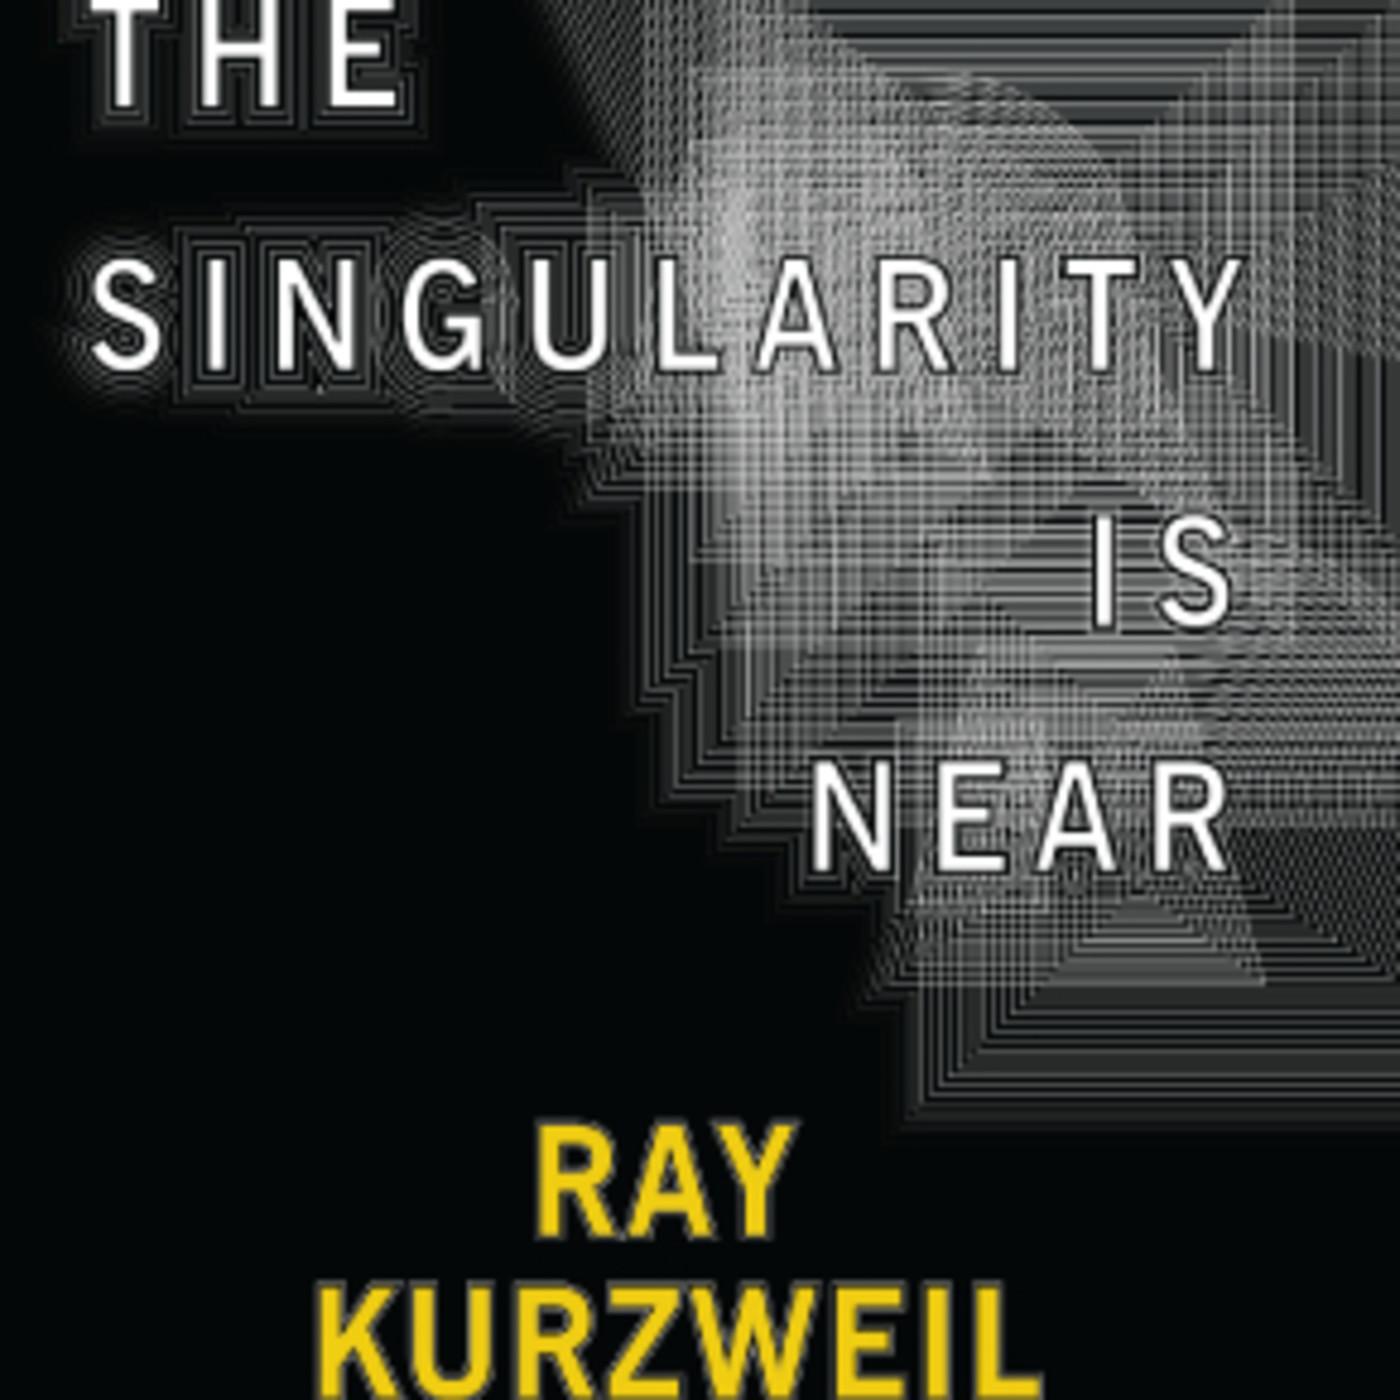 La singularidad está cerca (Ray Kurzweil) - Aurioresumen en ...